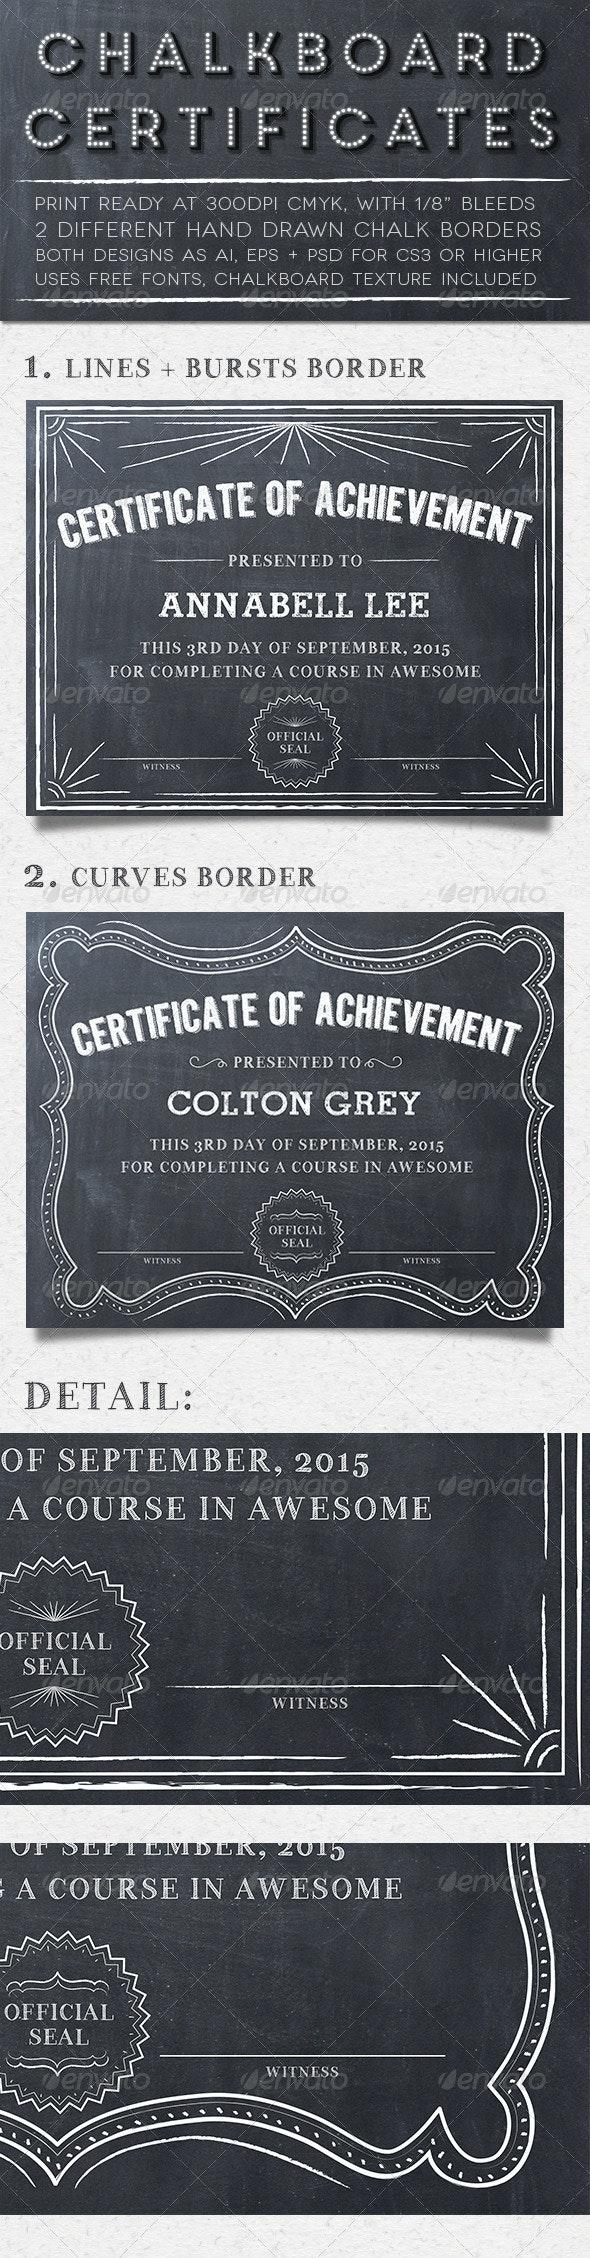 Chalkboard Certificates - Certificates Stationery